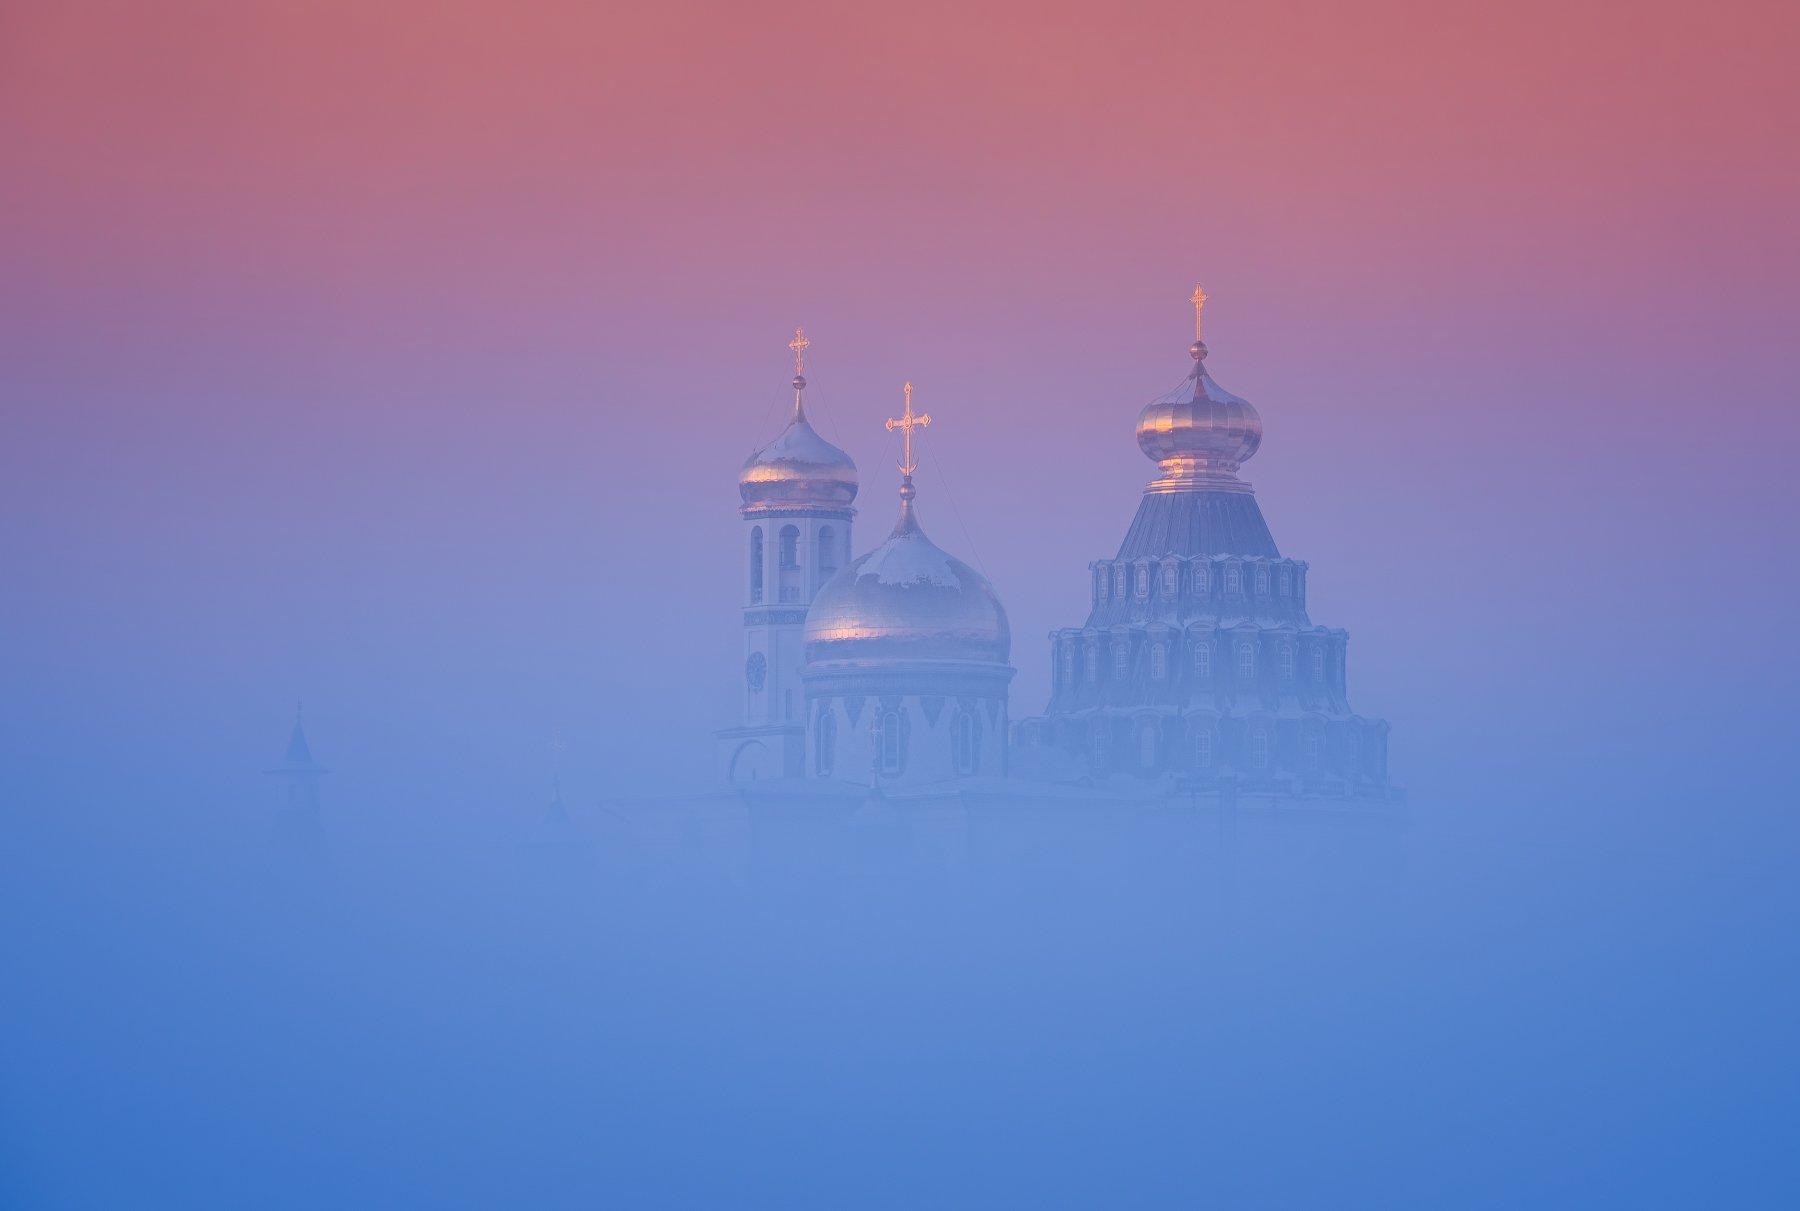 зима, рассвет, утро, пейзаж, истра, Левыкин Виталий